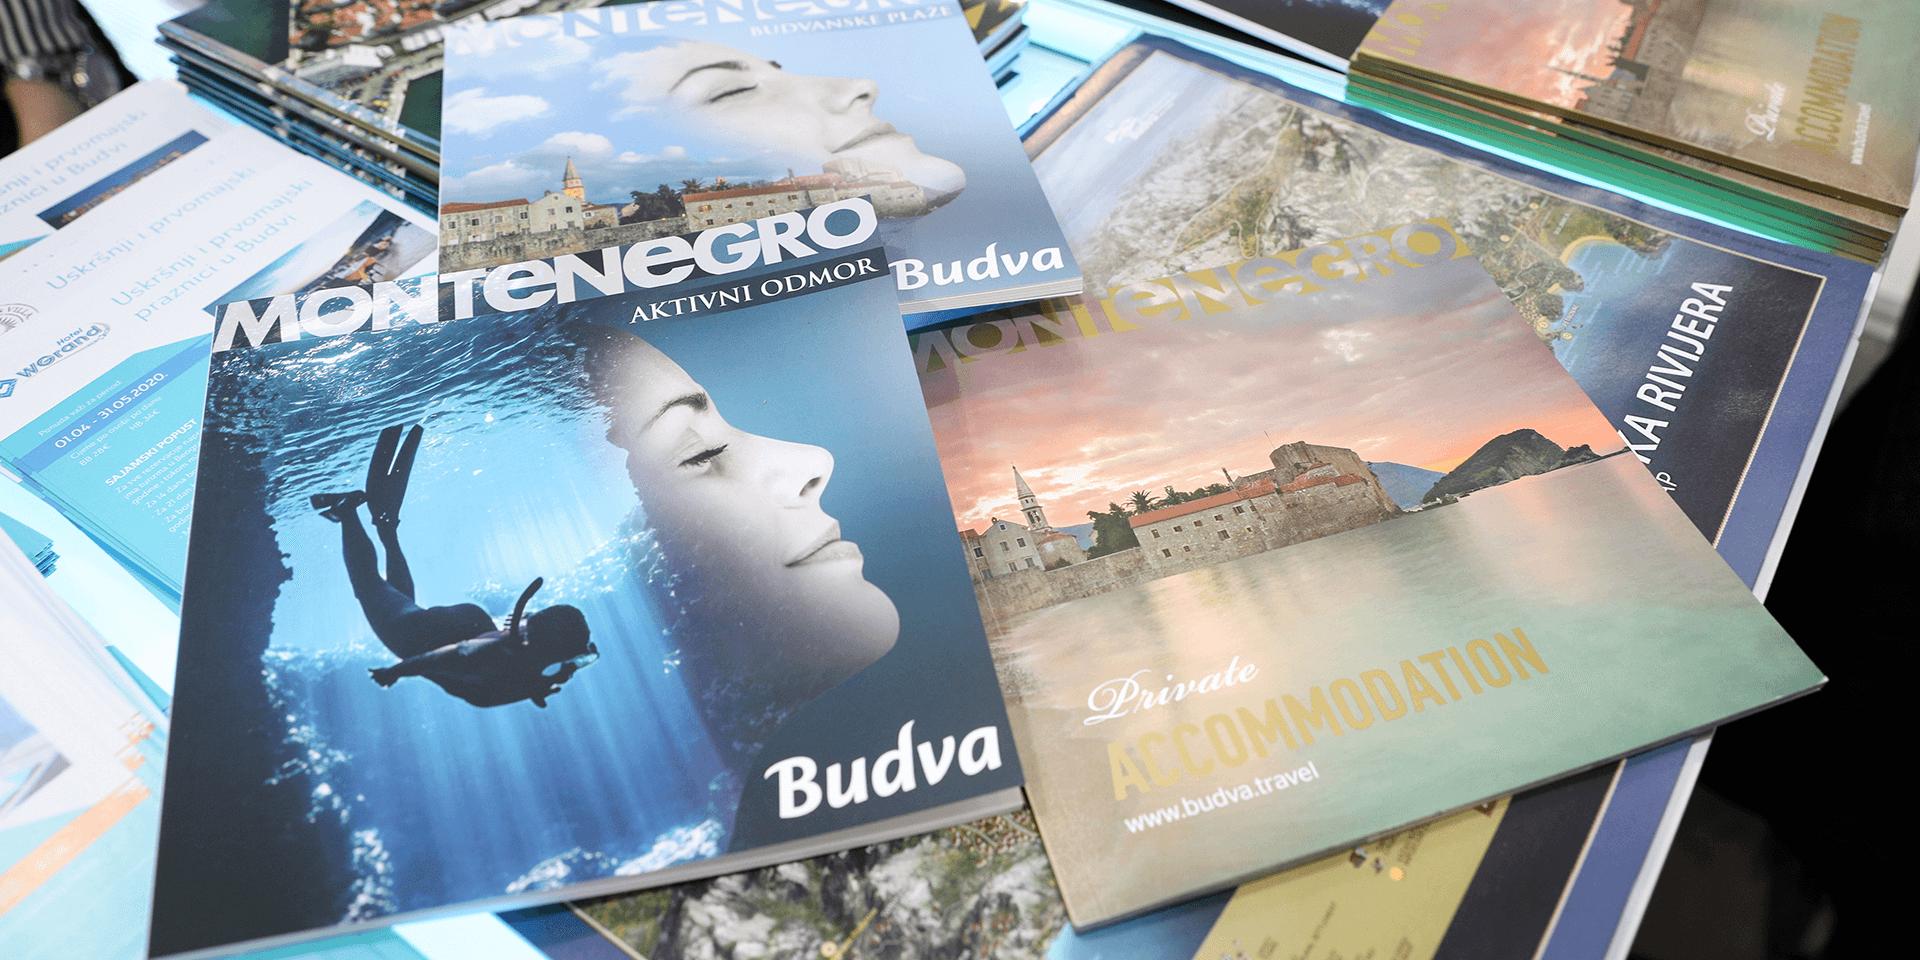 budva budva-nightlife budva-hotels budva-activities adriatic-sea